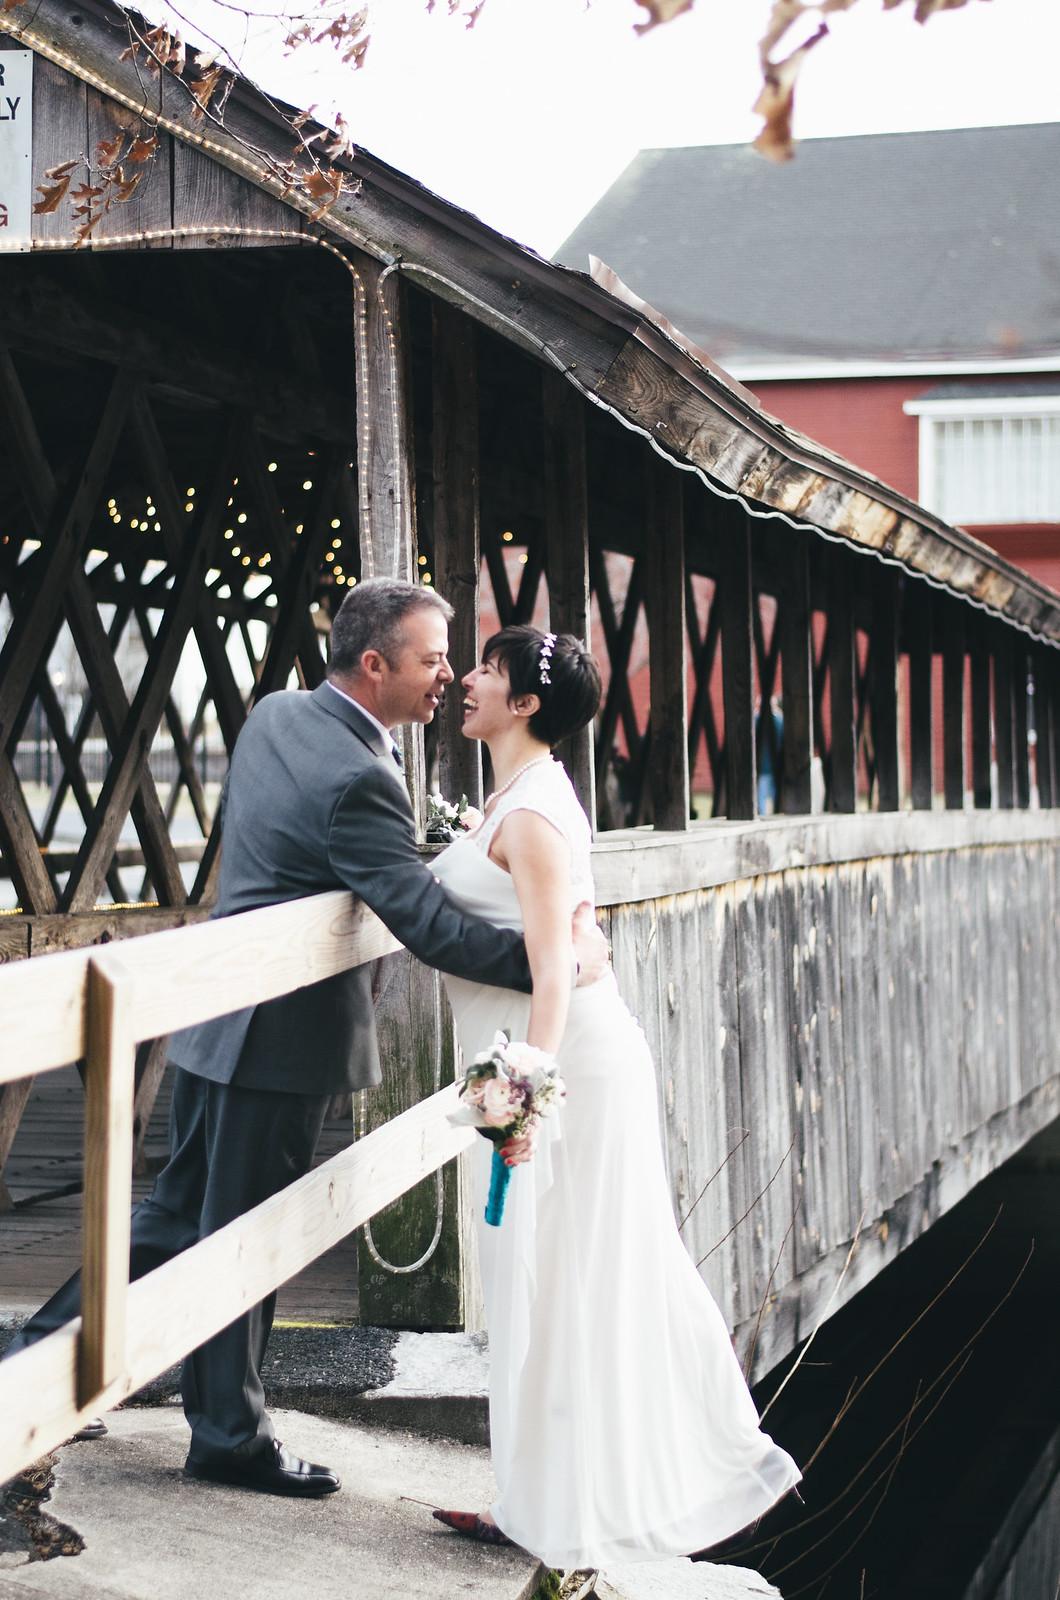 Covered Bridge Wedding on juliettelaura.blogspot.com